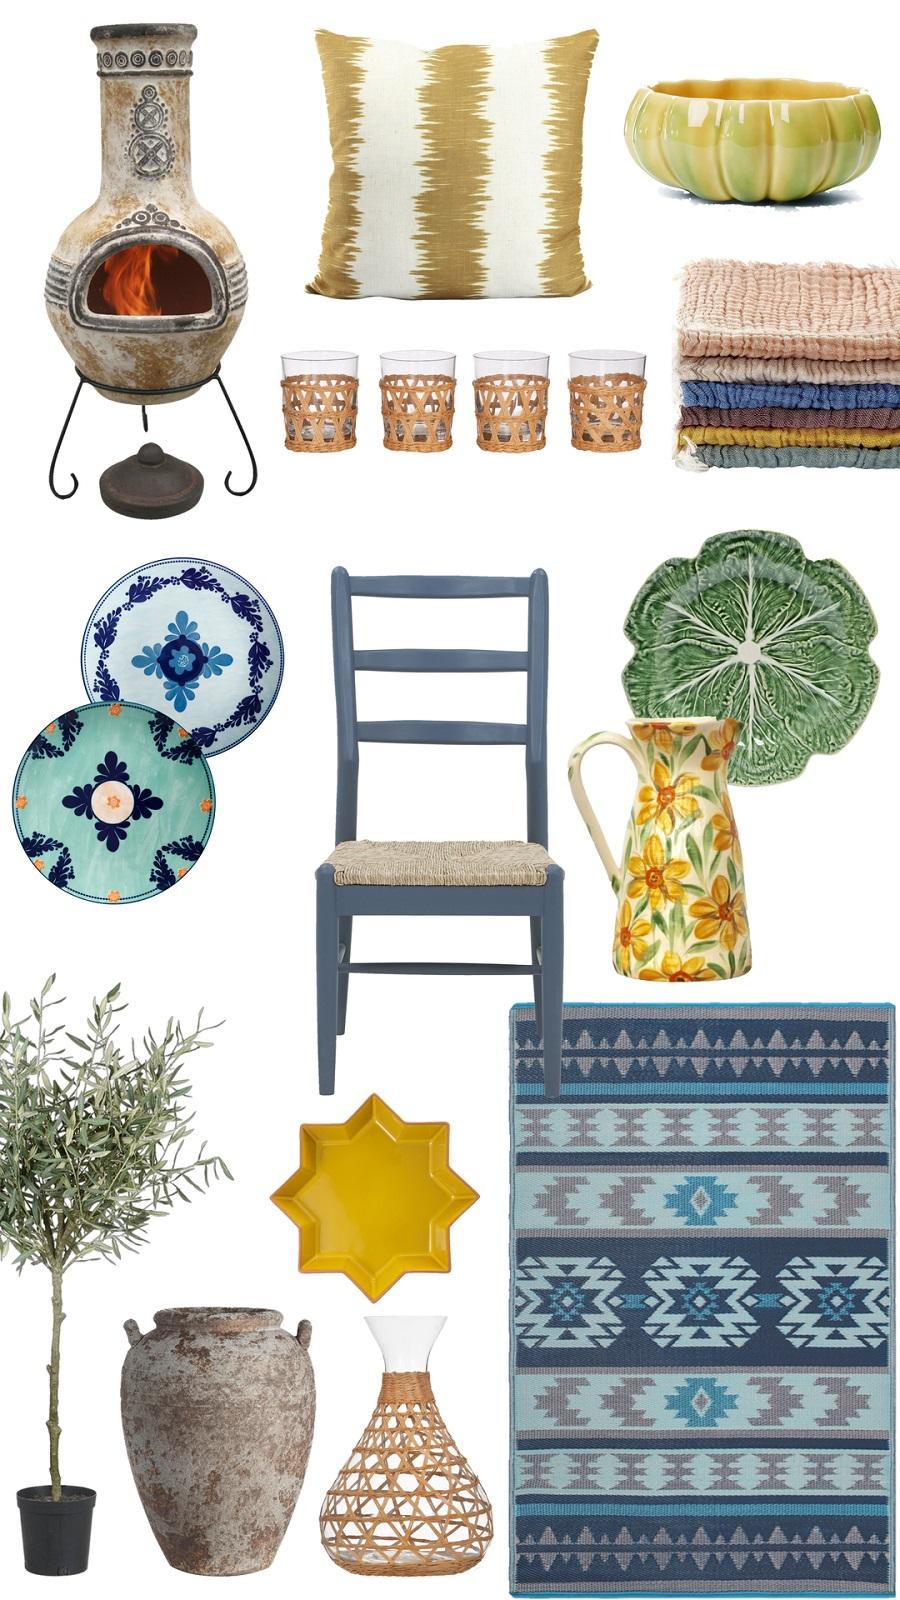 Bring a Taste of the Mediterranean into the Garden This Summer